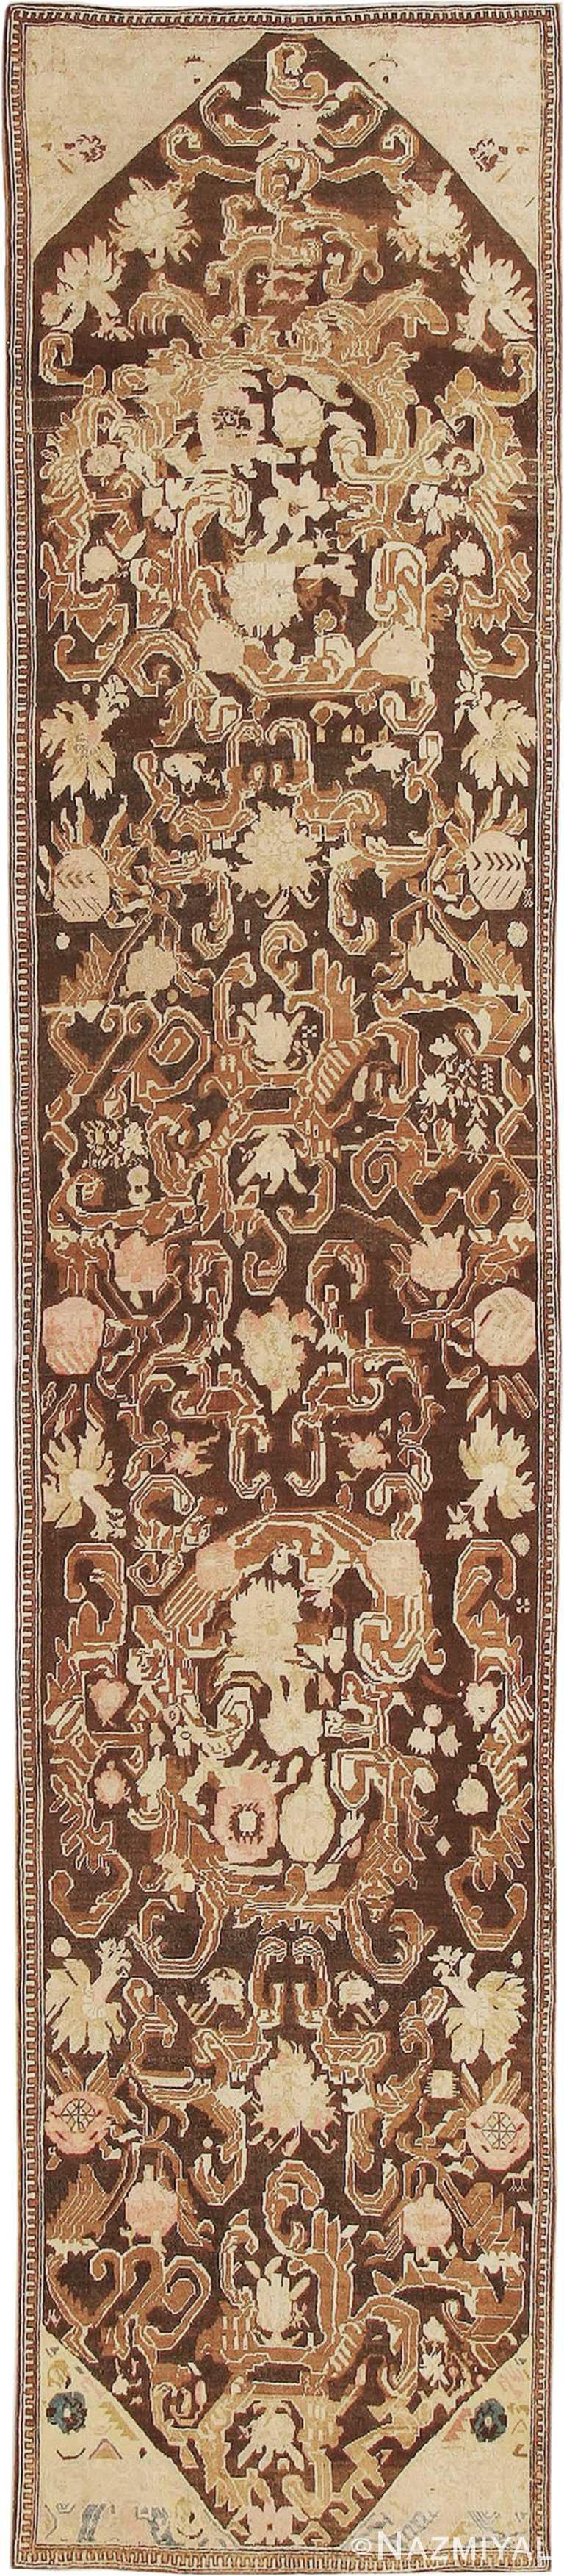 Antique Brown Caucasian Karabagh Hallway Runner Rug #1120 by Nazmiyal Antique Rugs